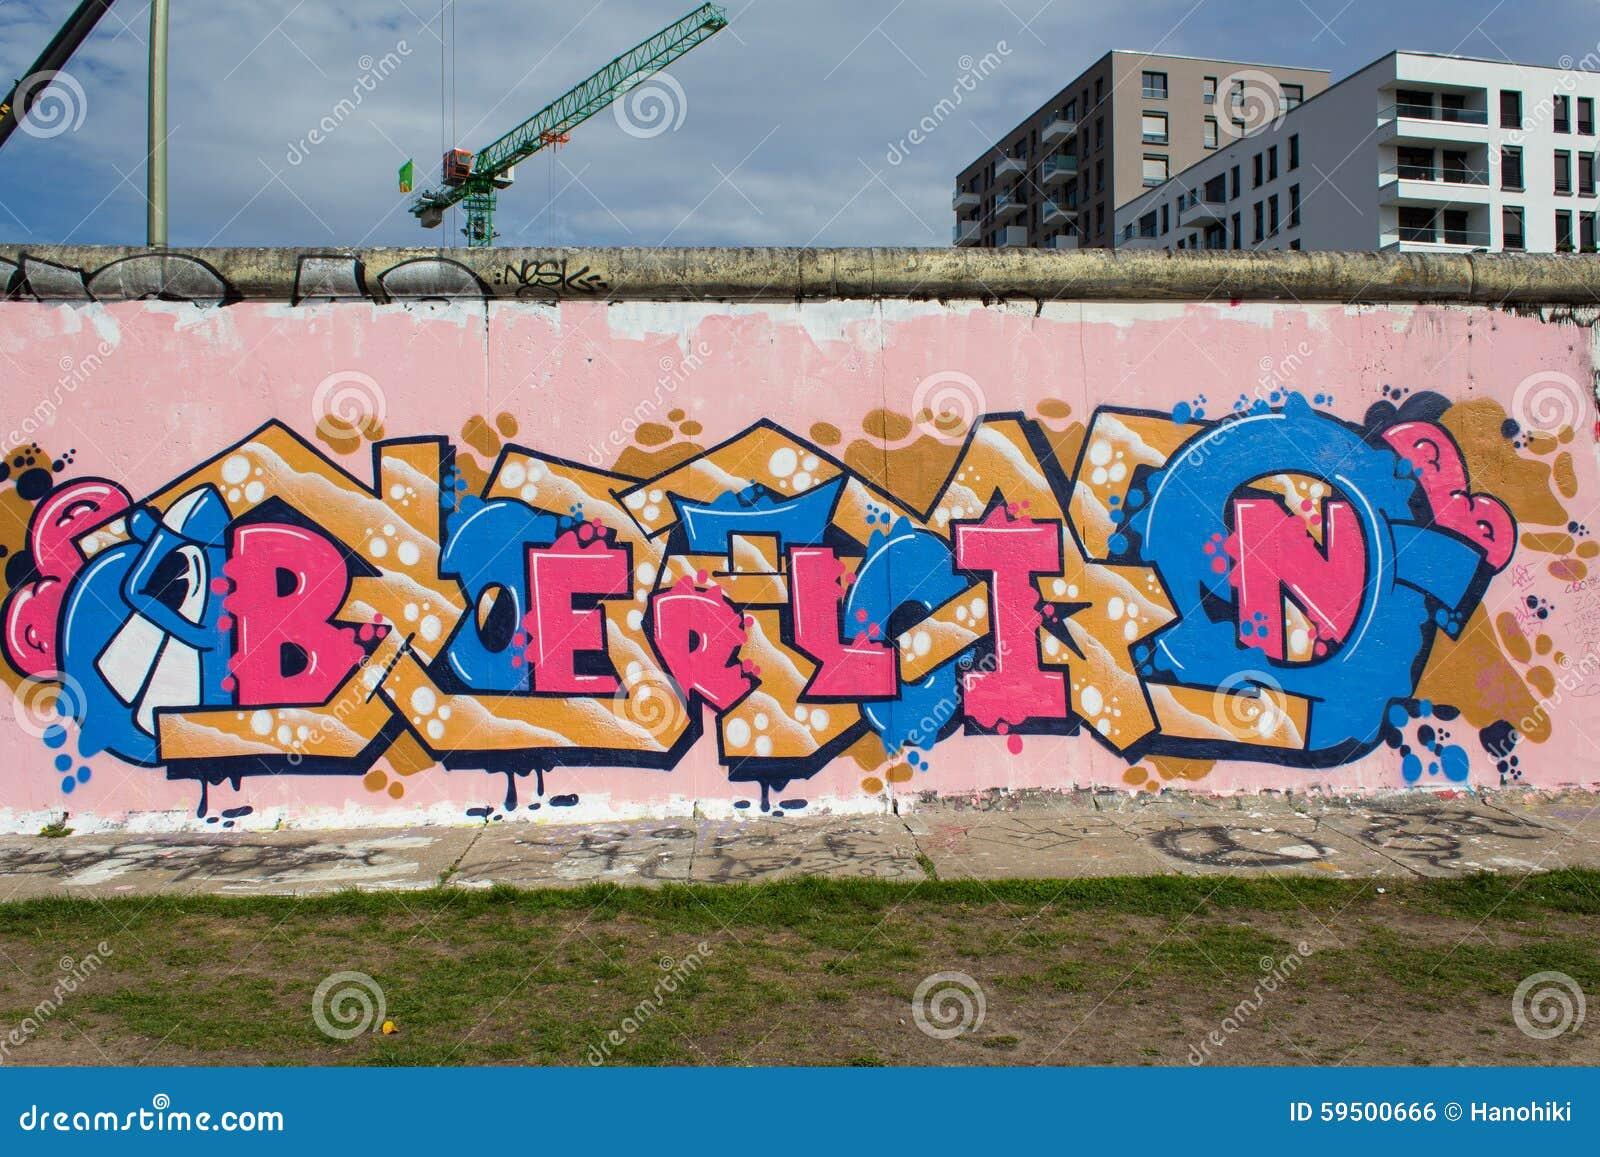 berliner mauer mit berlin graffiti redaktionelles foto. Black Bedroom Furniture Sets. Home Design Ideas